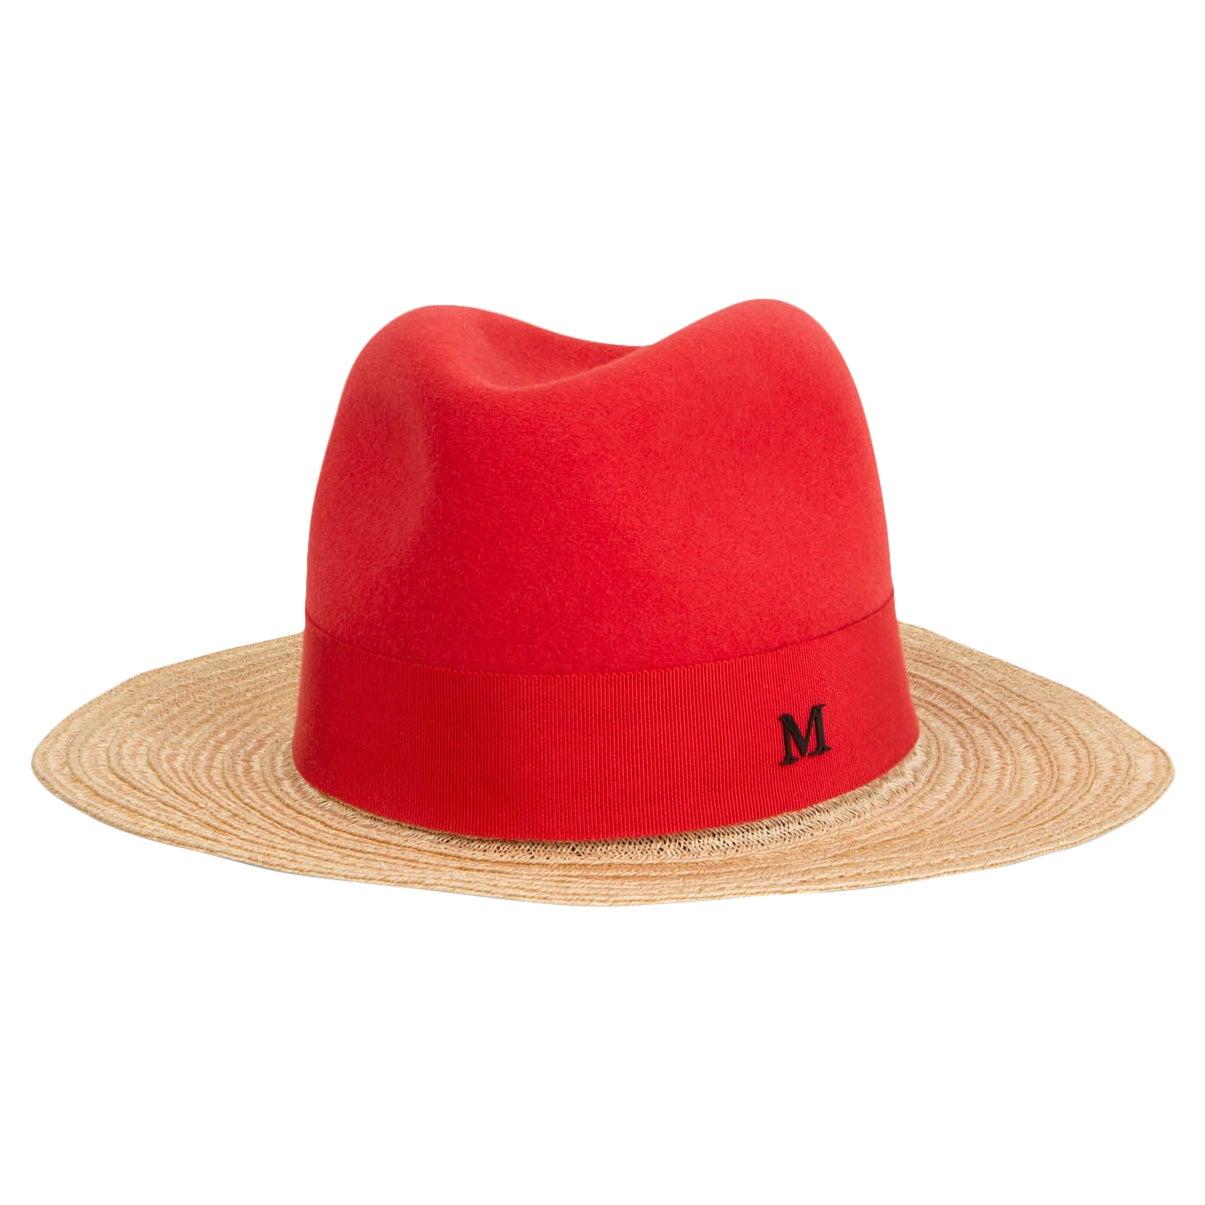 MAISON MICHEL red Felt & Straw Fedora Hat S